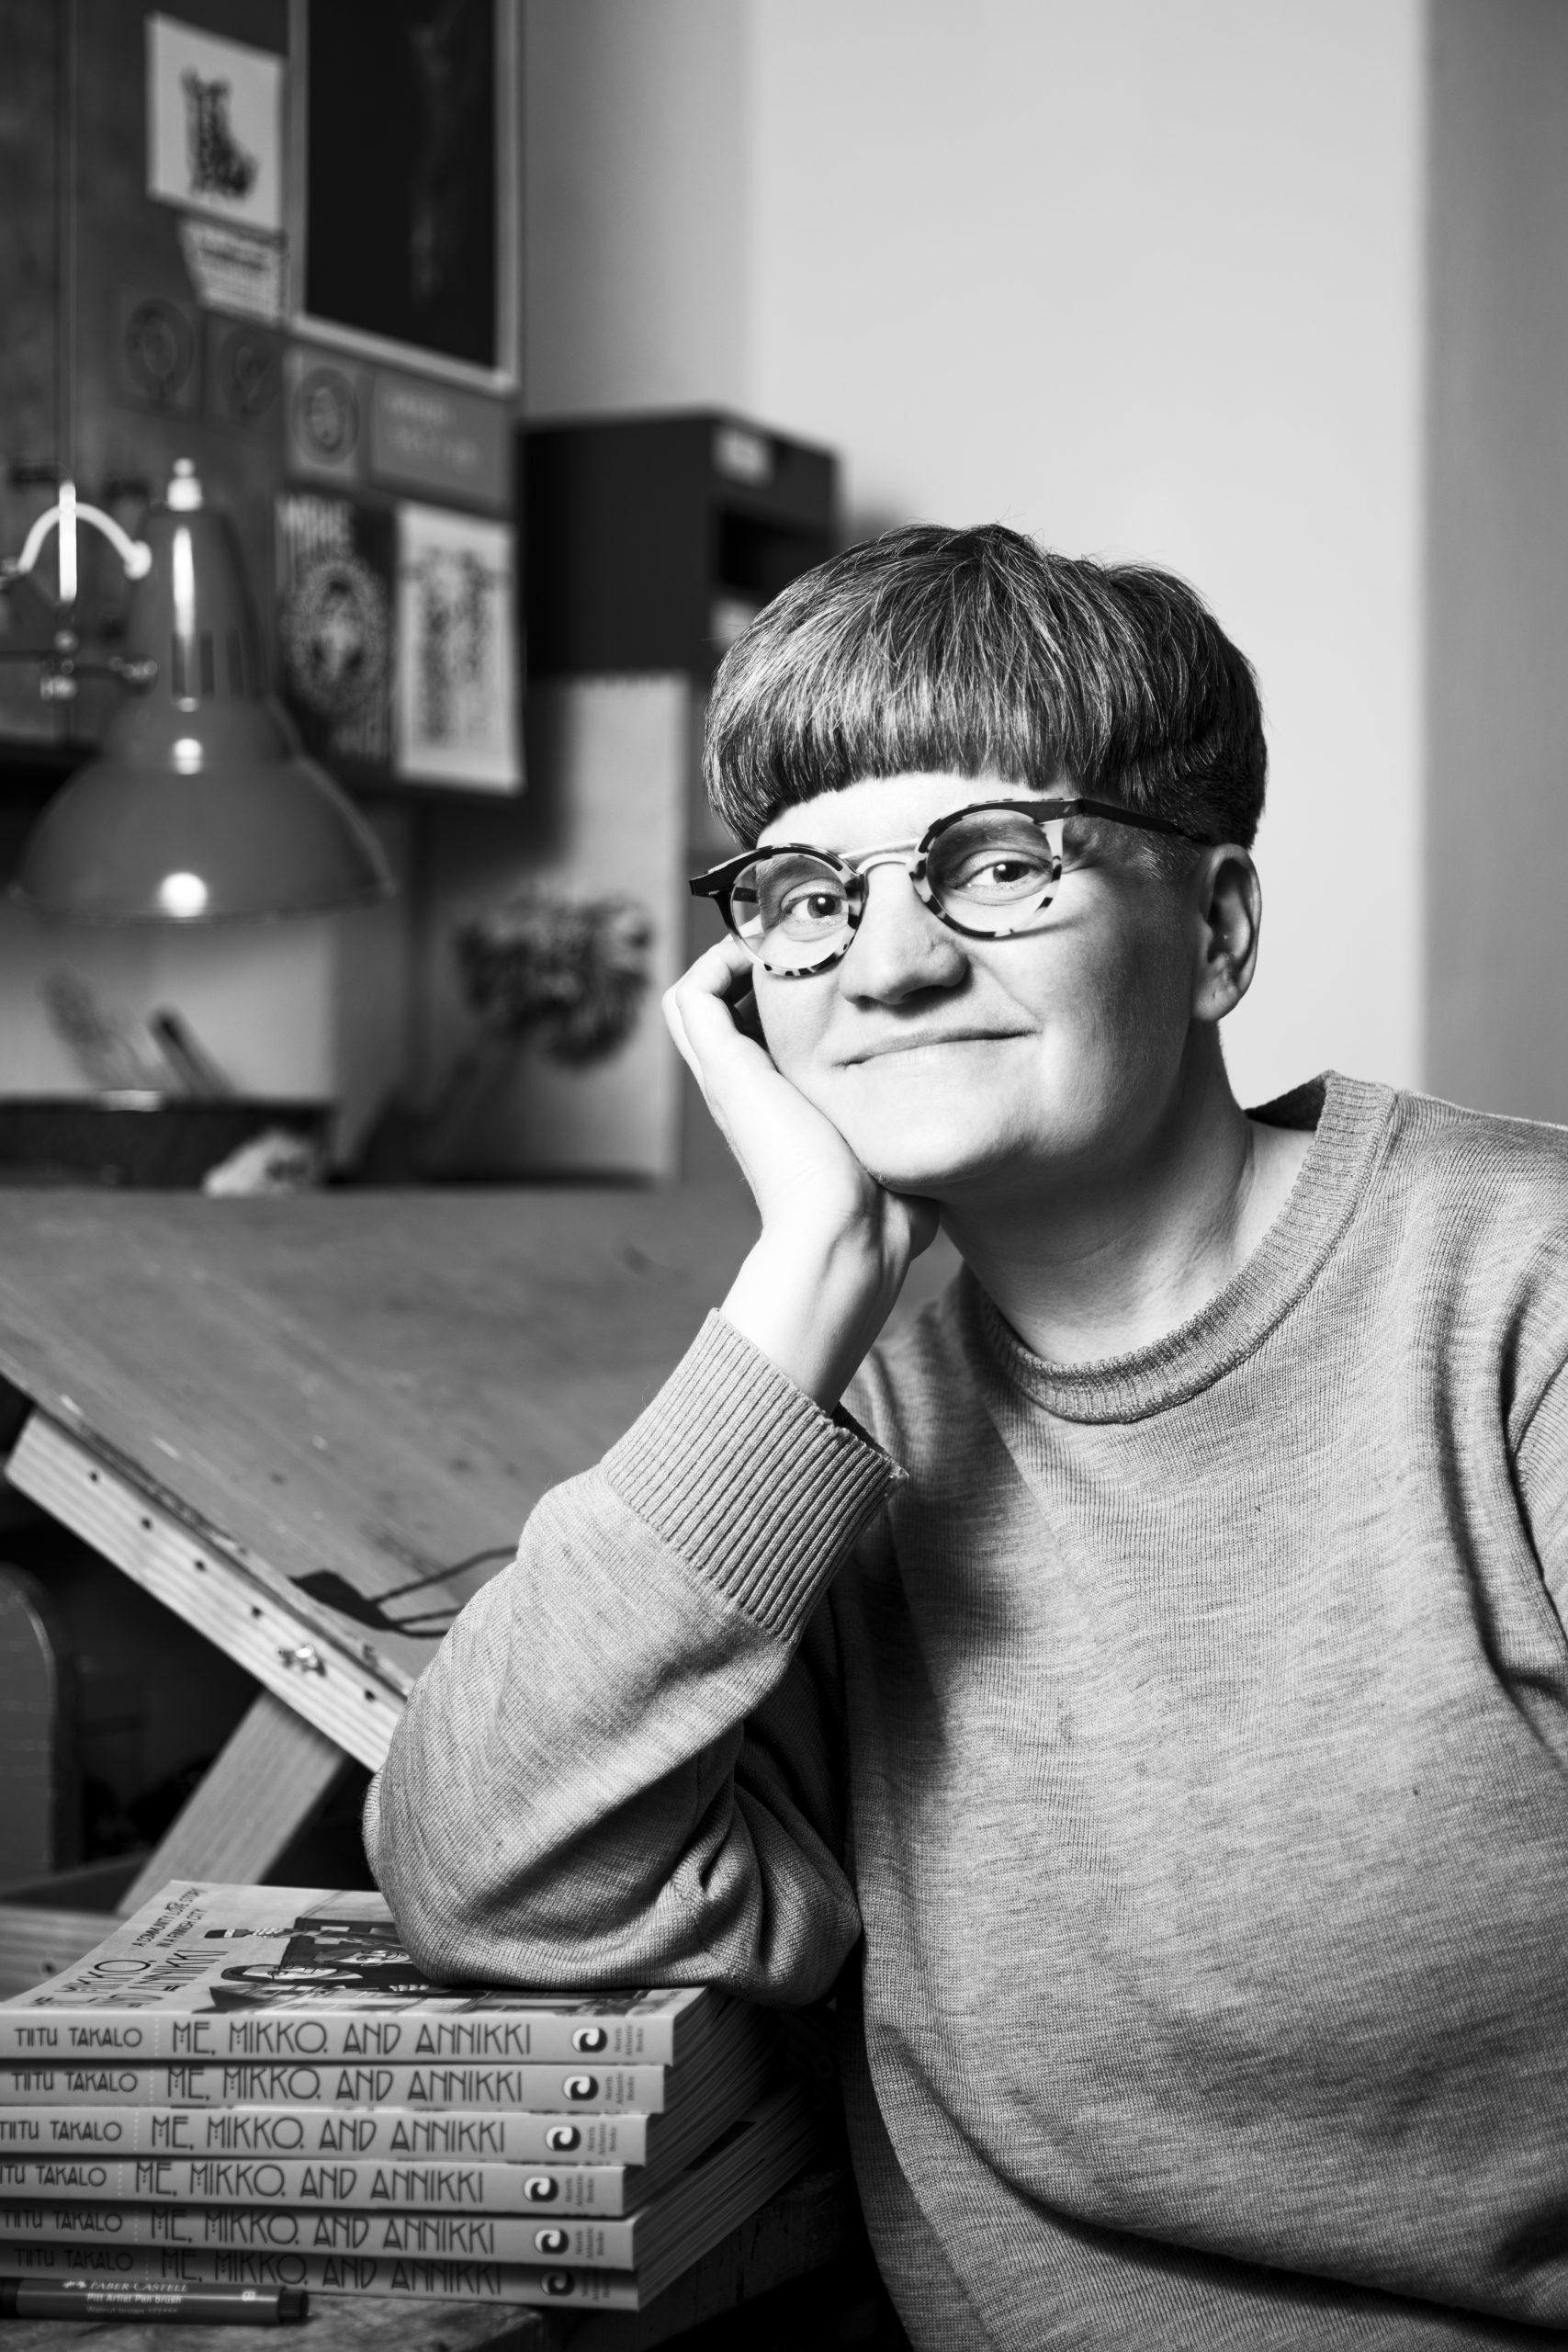 Vimma-palkinto sarjakuvataiteilija Tiitu Takalolle